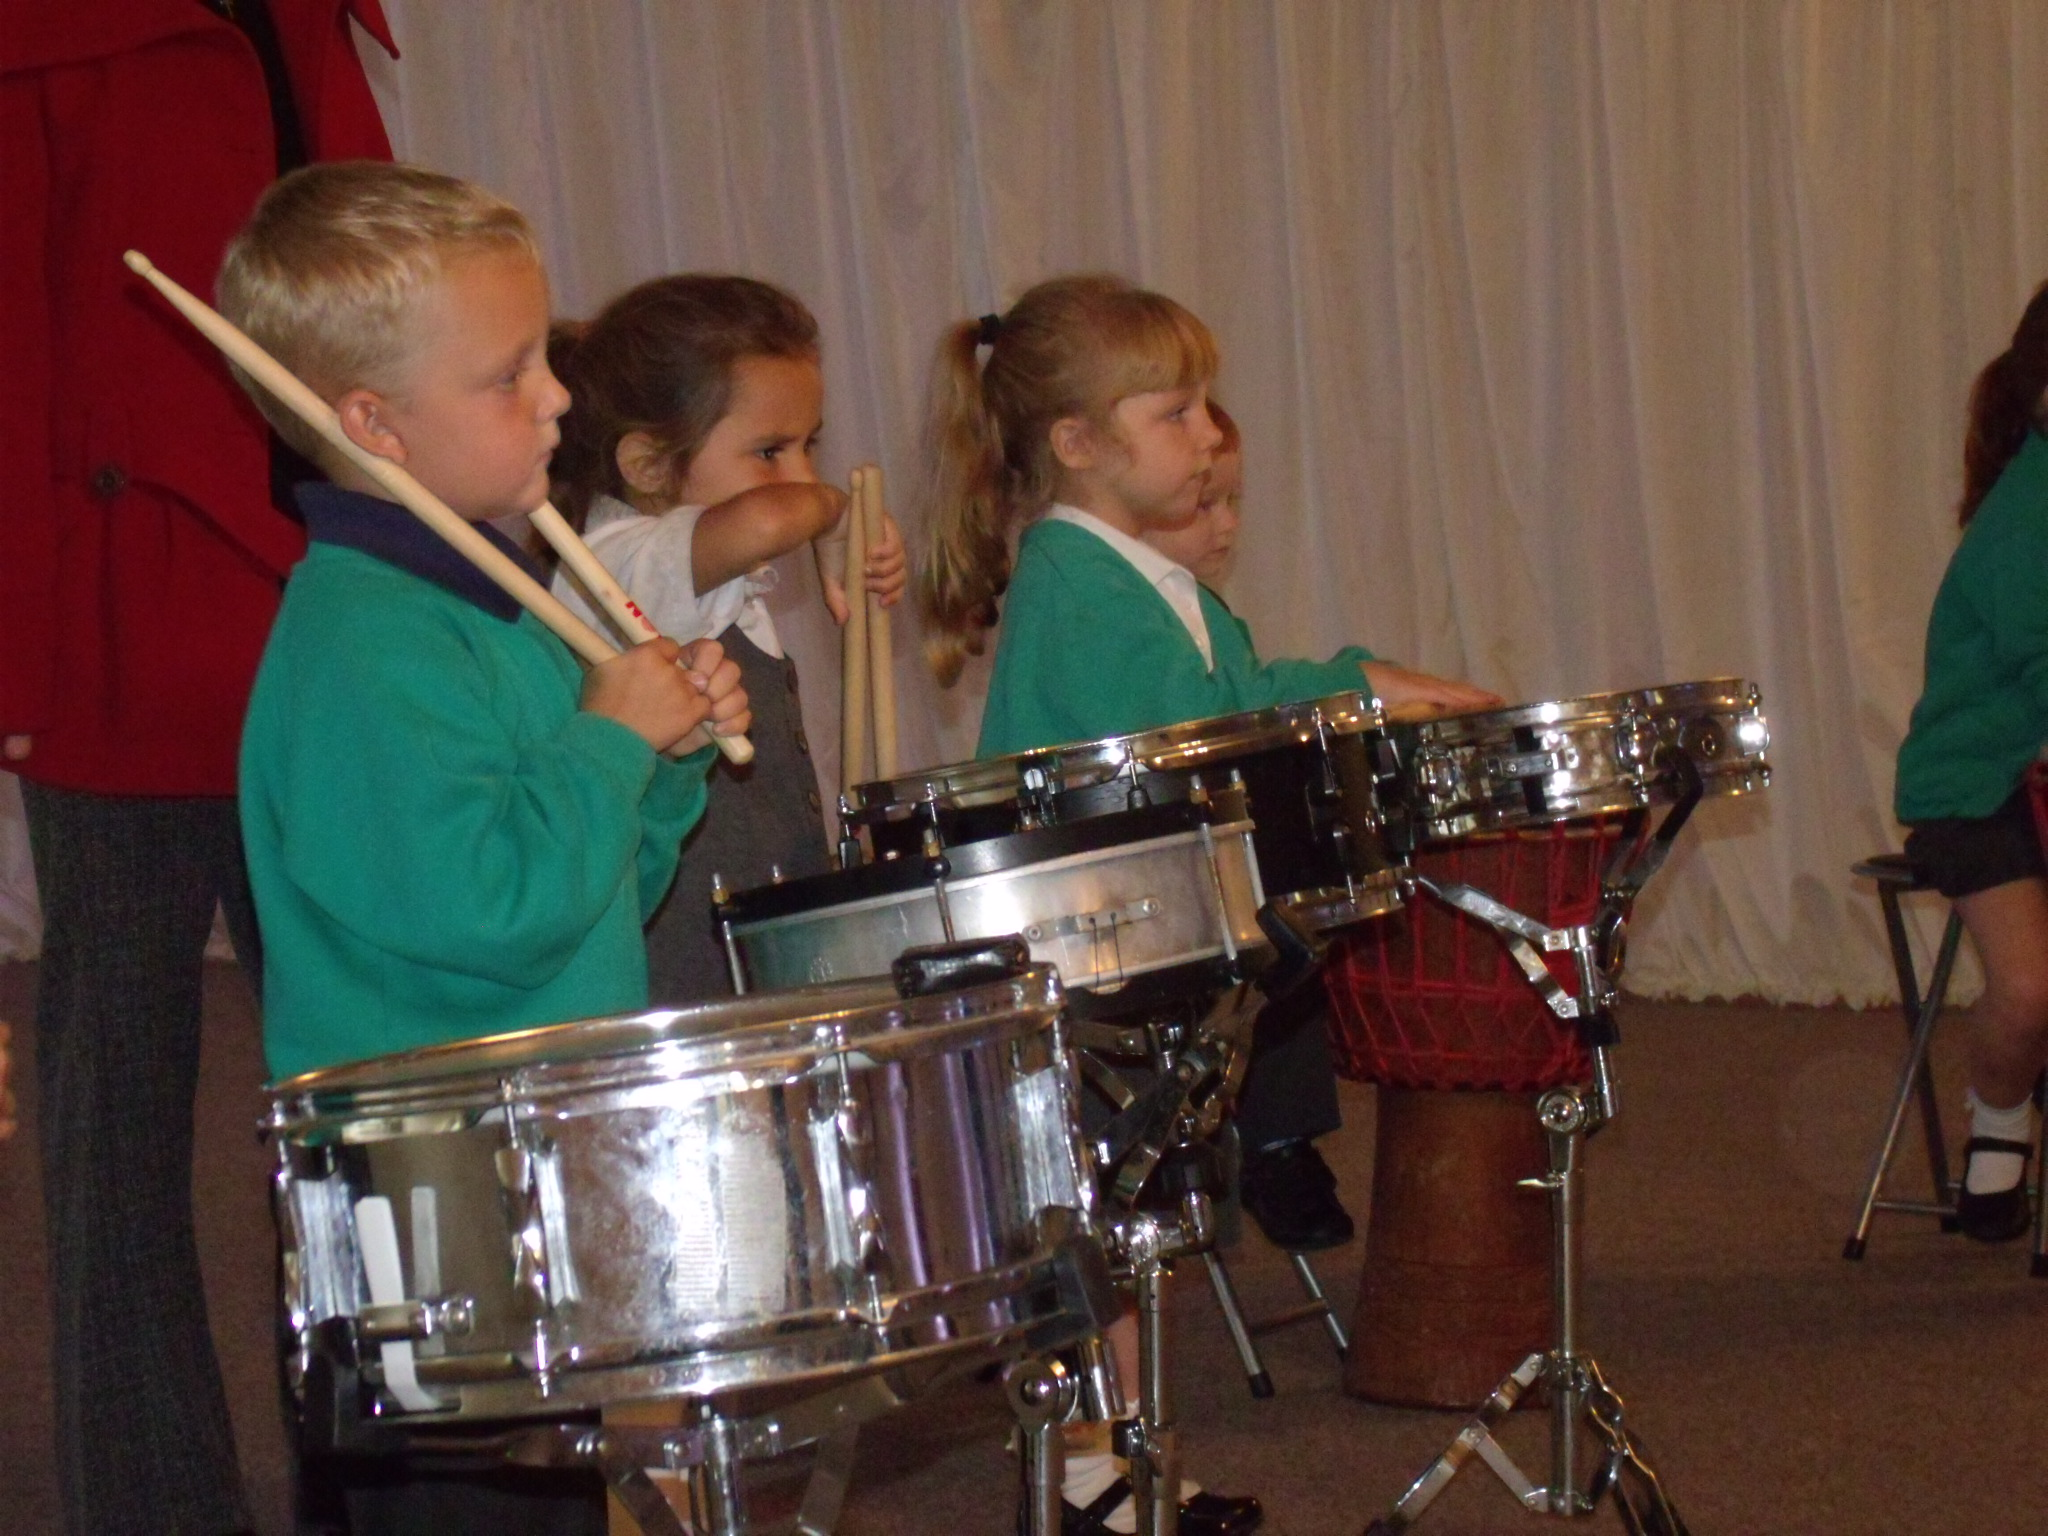 School children playing samba drums